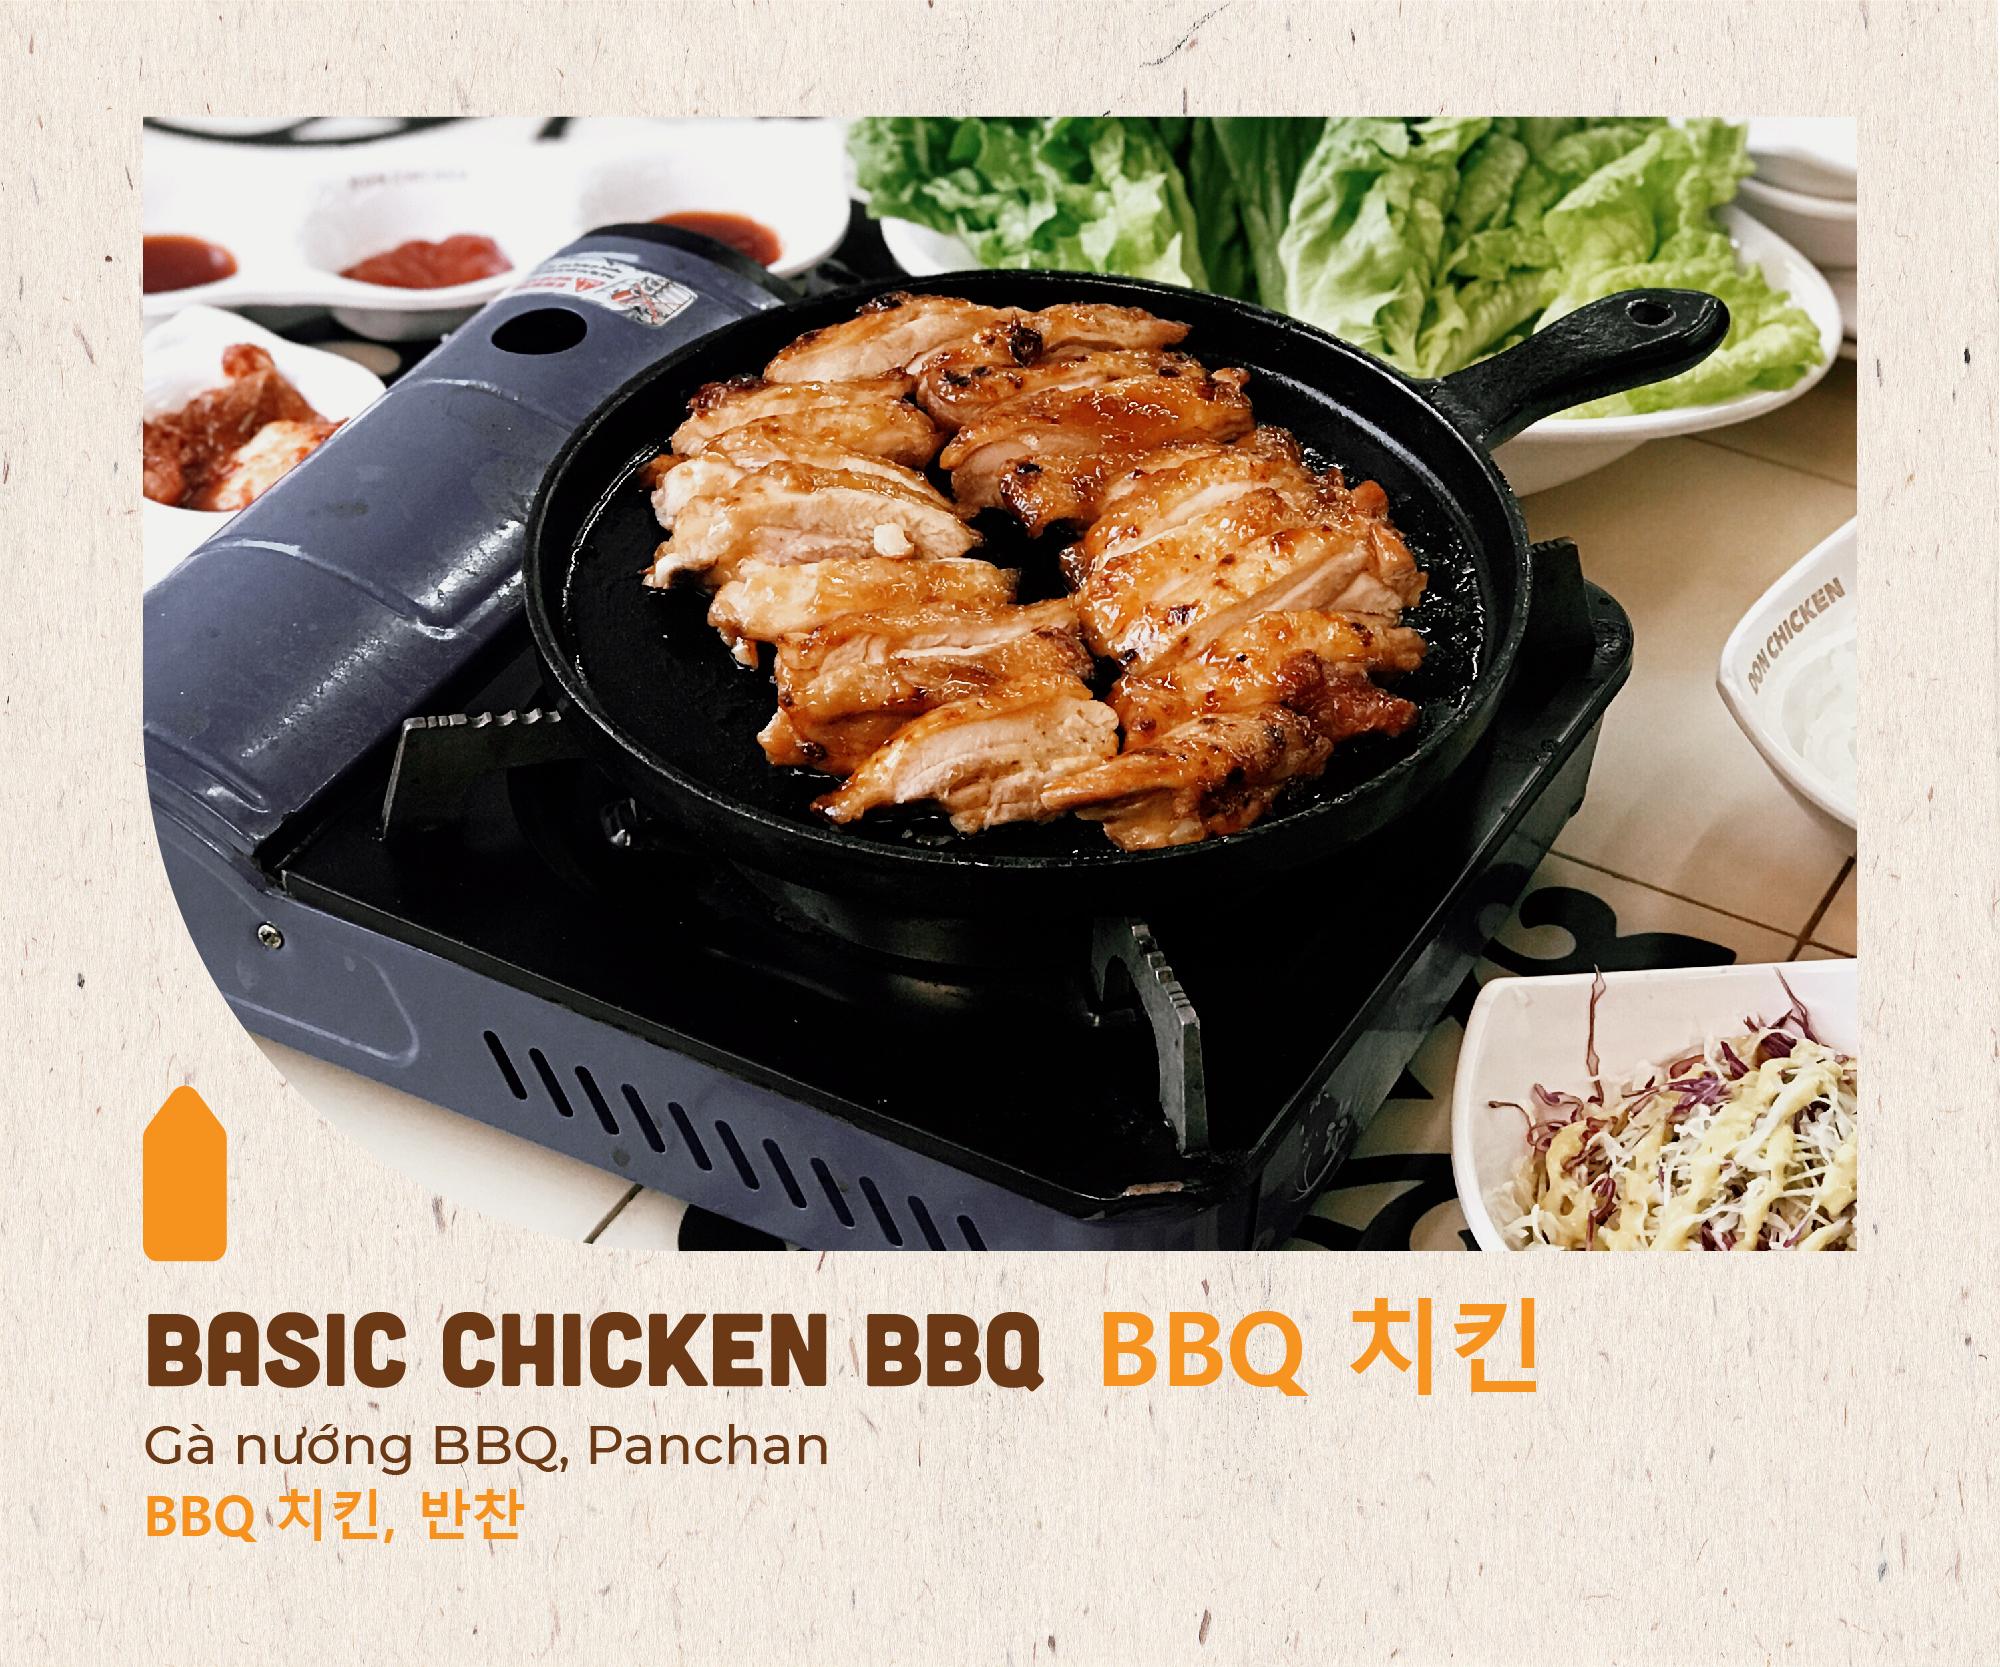 Basic Chicken BBQ